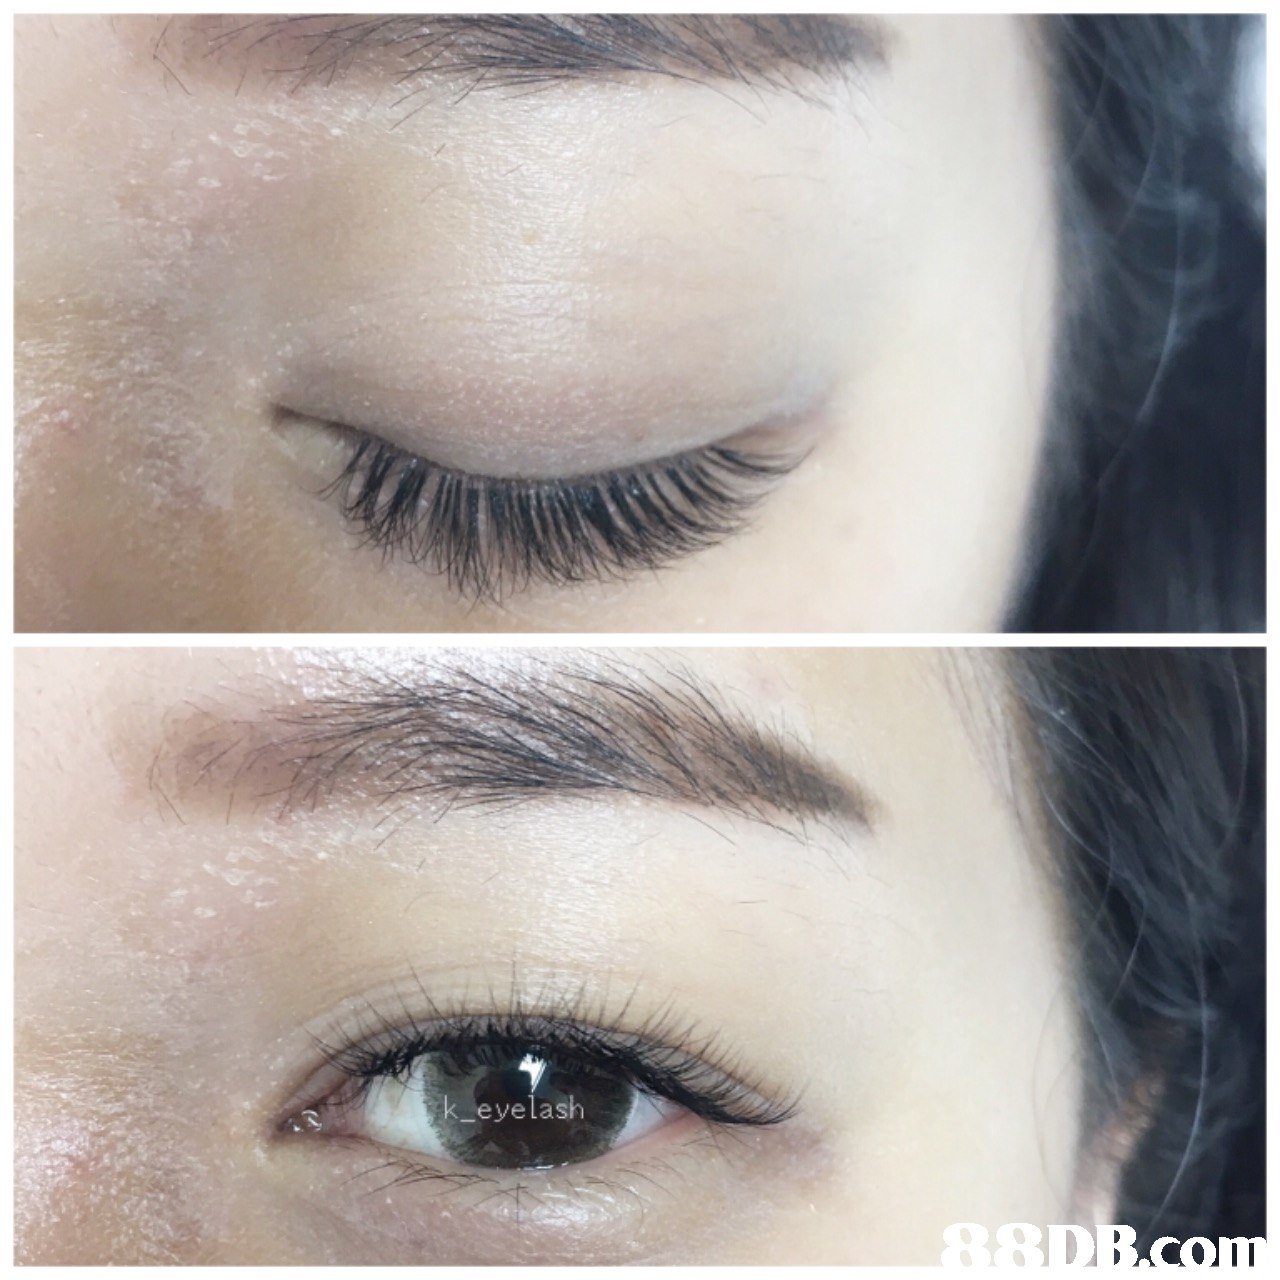 k eyelash  eyebrow,eyelash,eye shadow,beauty,eye